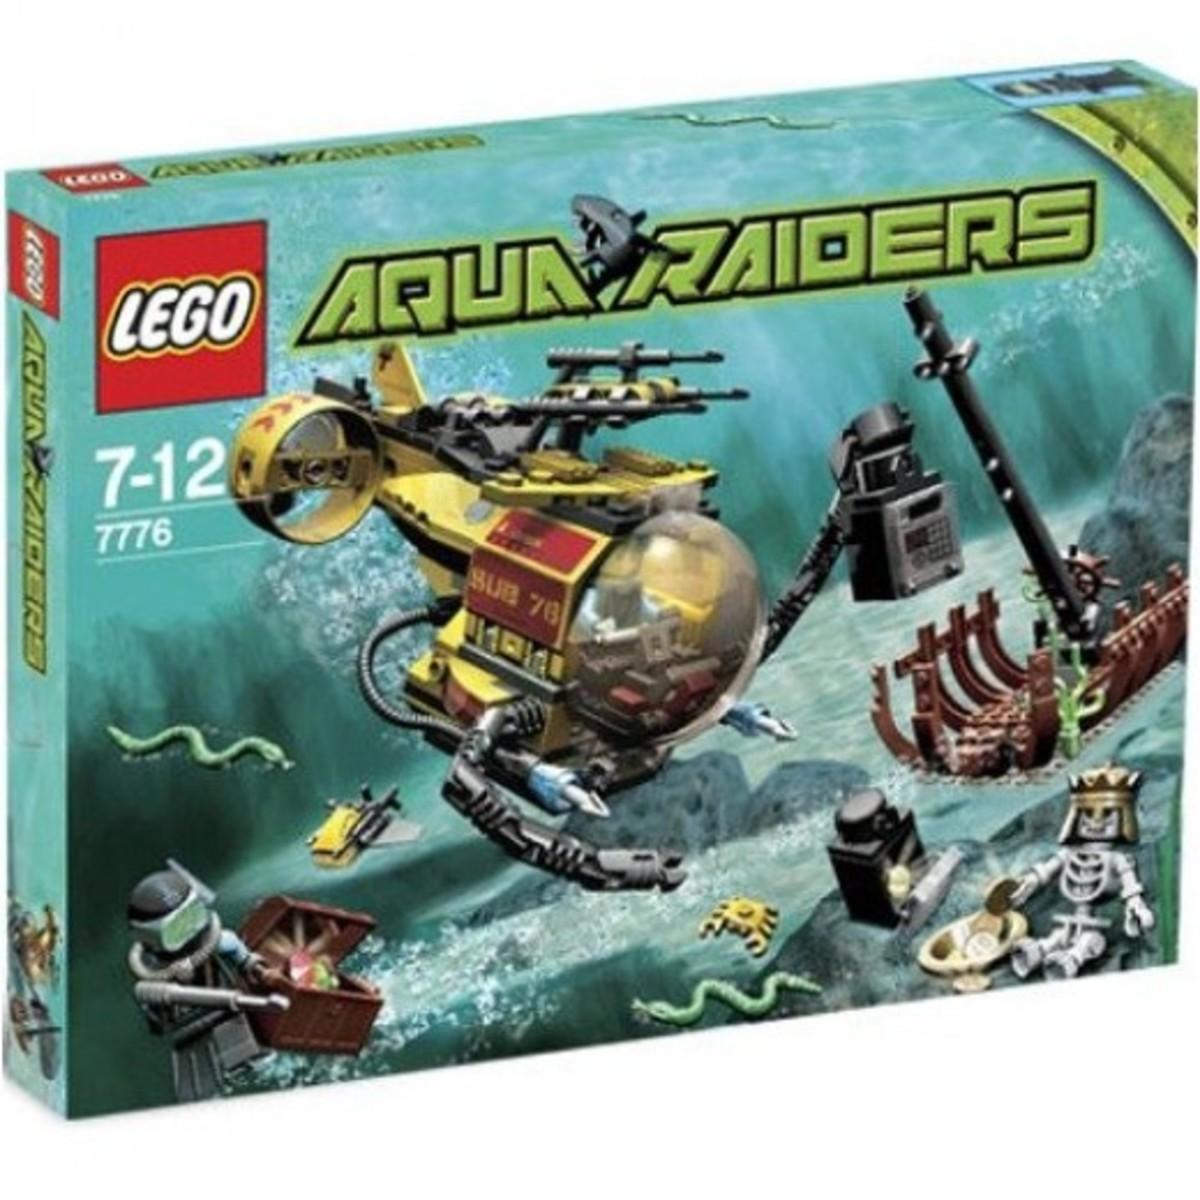 LEGO Aqua Raiders The Shipwreck 7776 Box